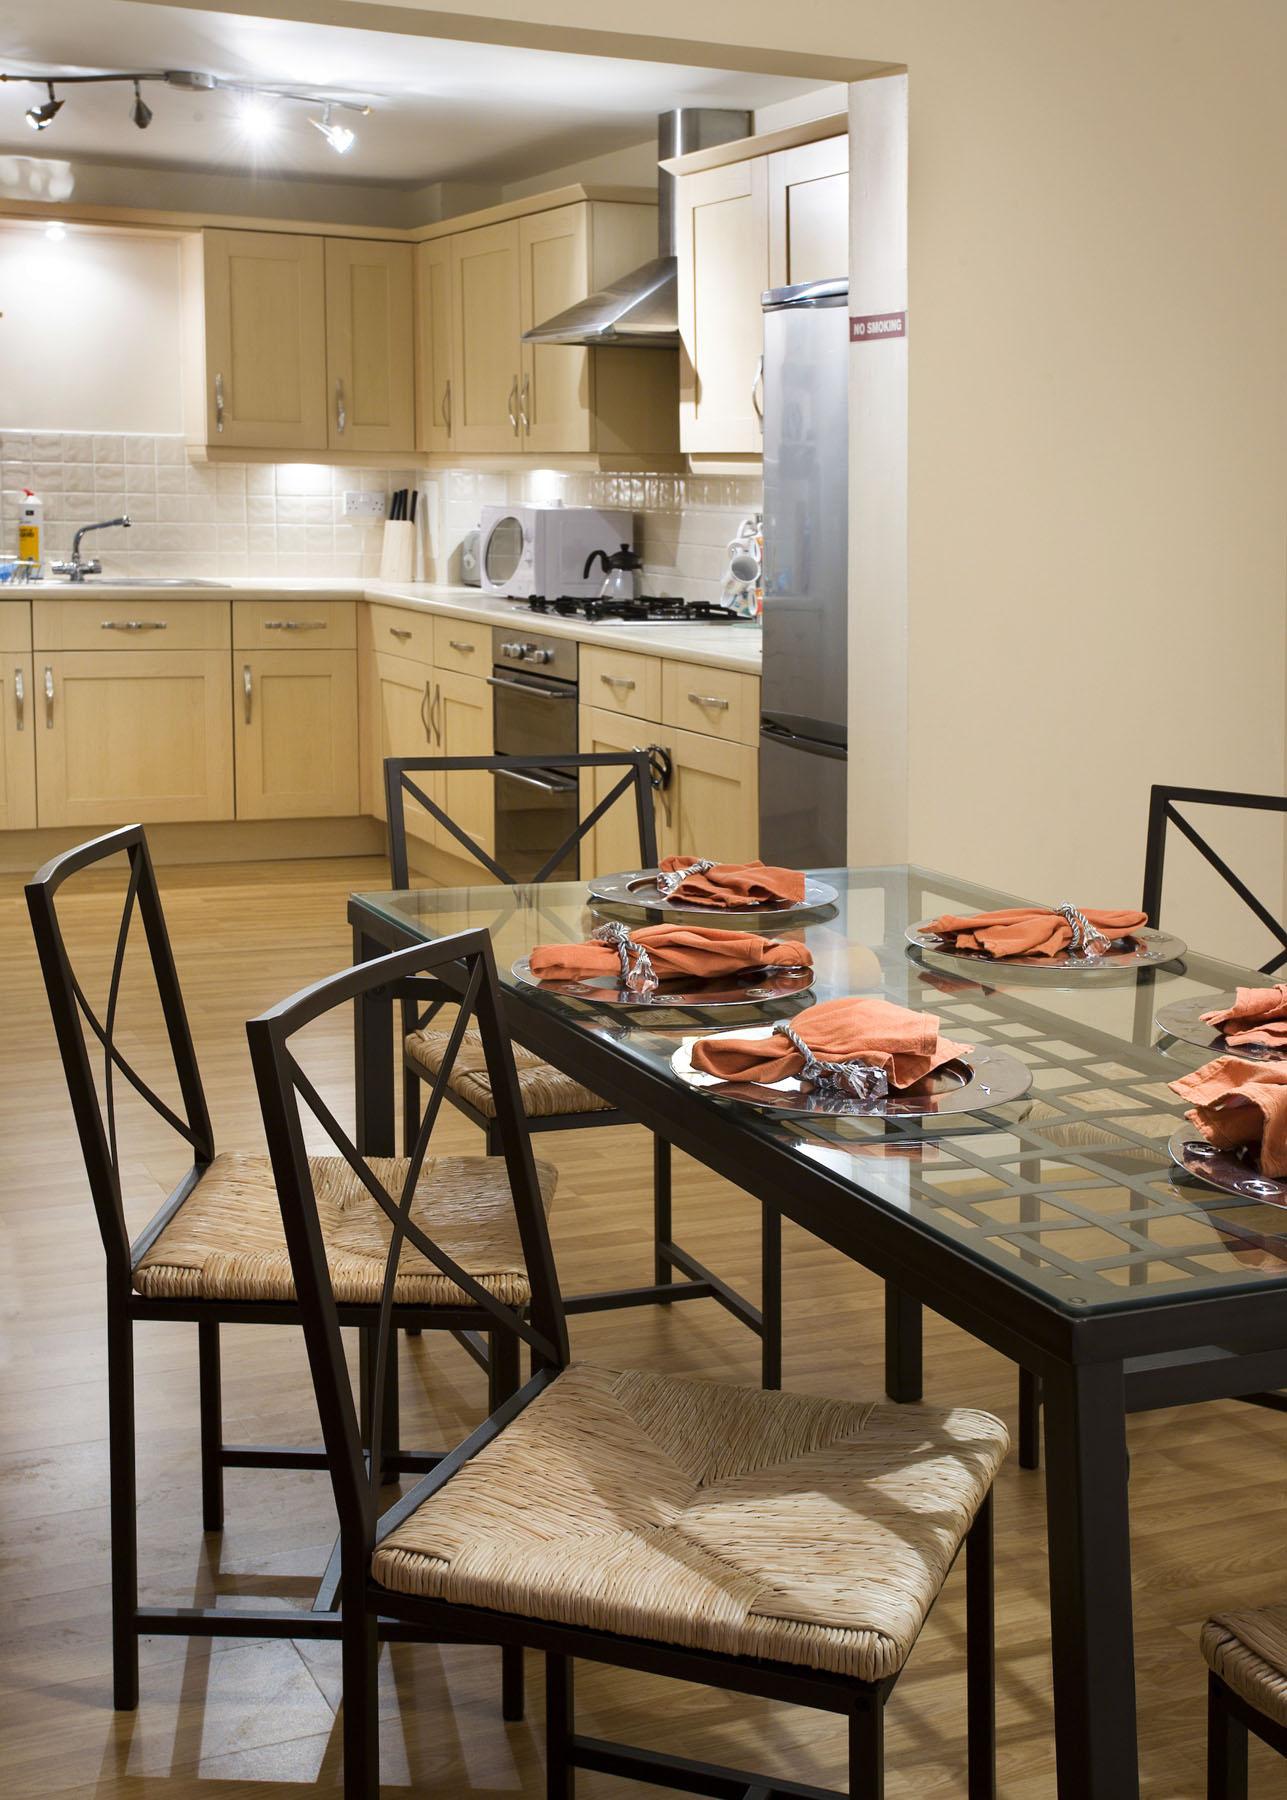 235 Dalry Gait Apartment Edinburgh Holiday Accommodation